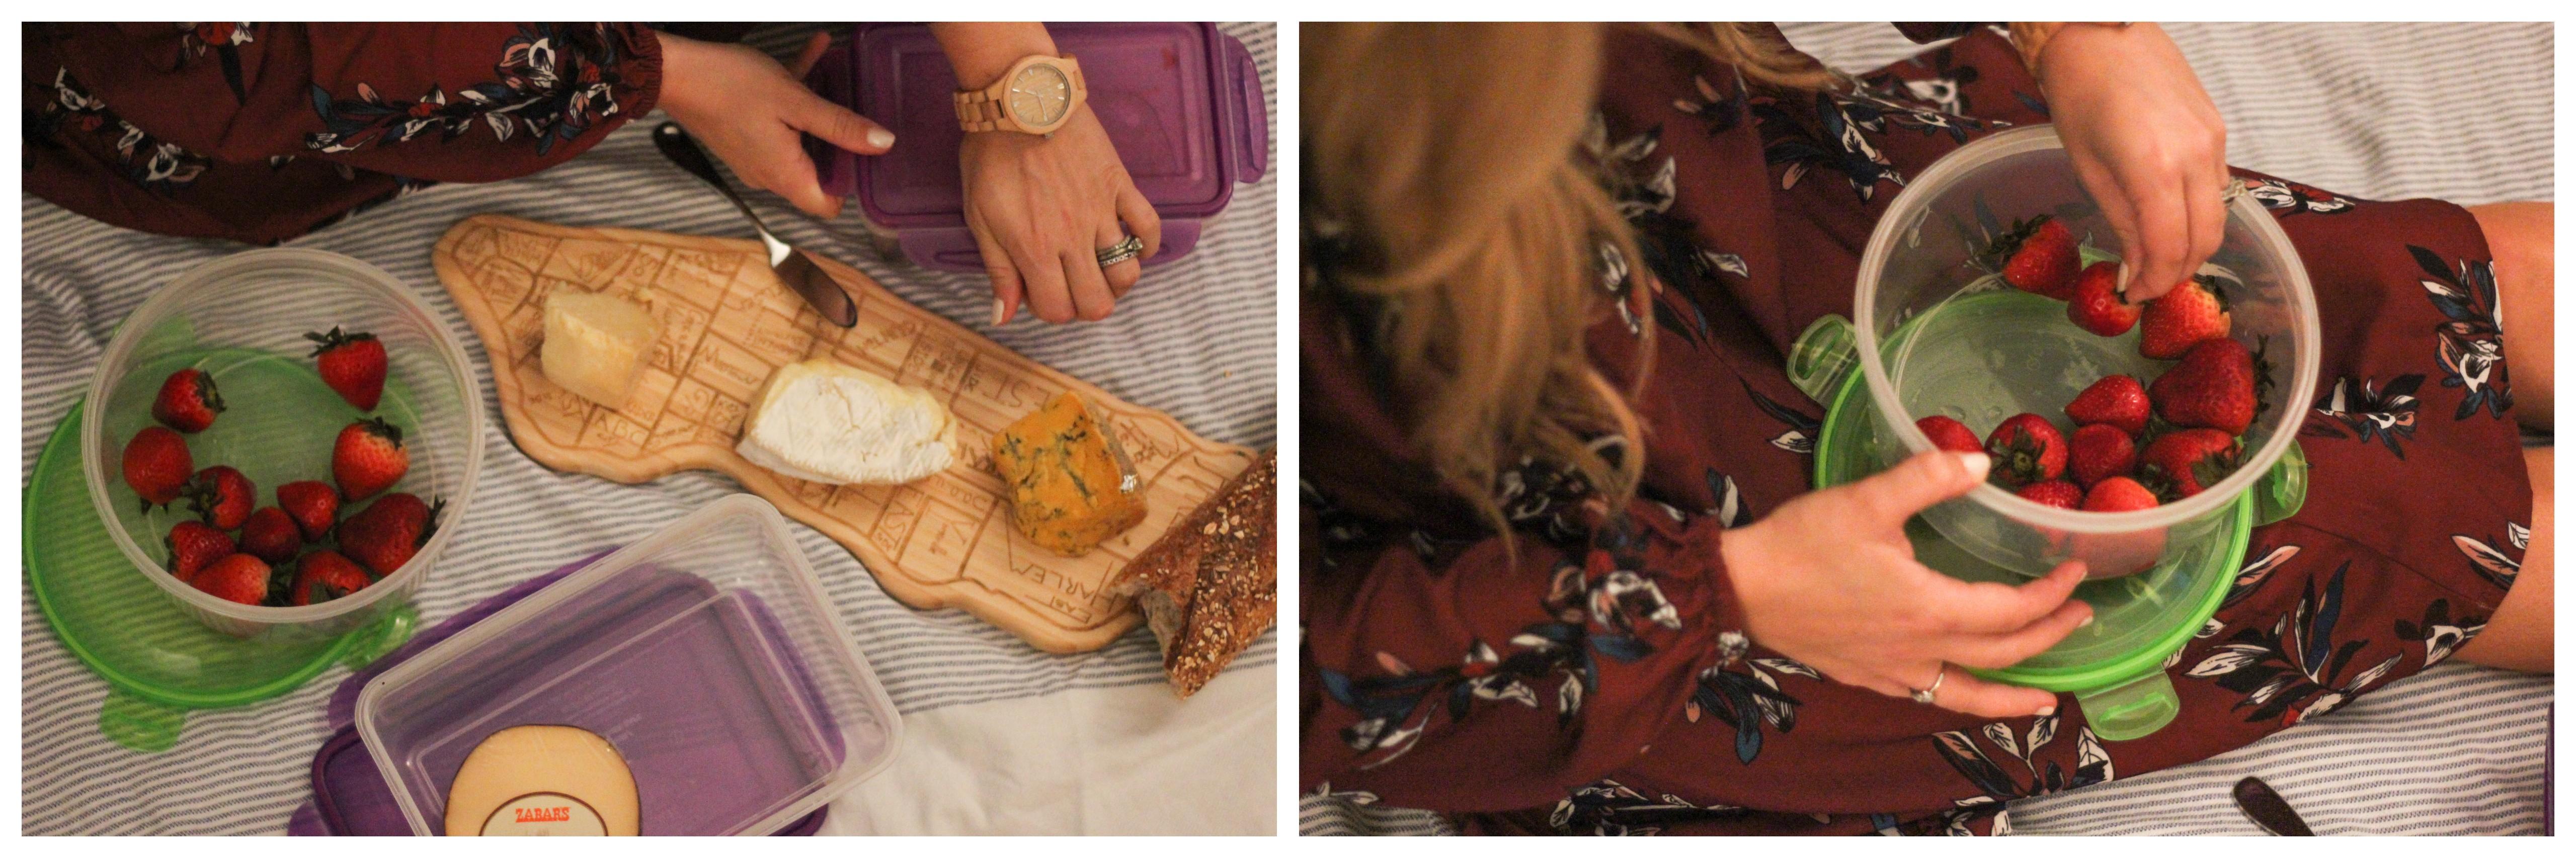 shein-picnic-edited-005